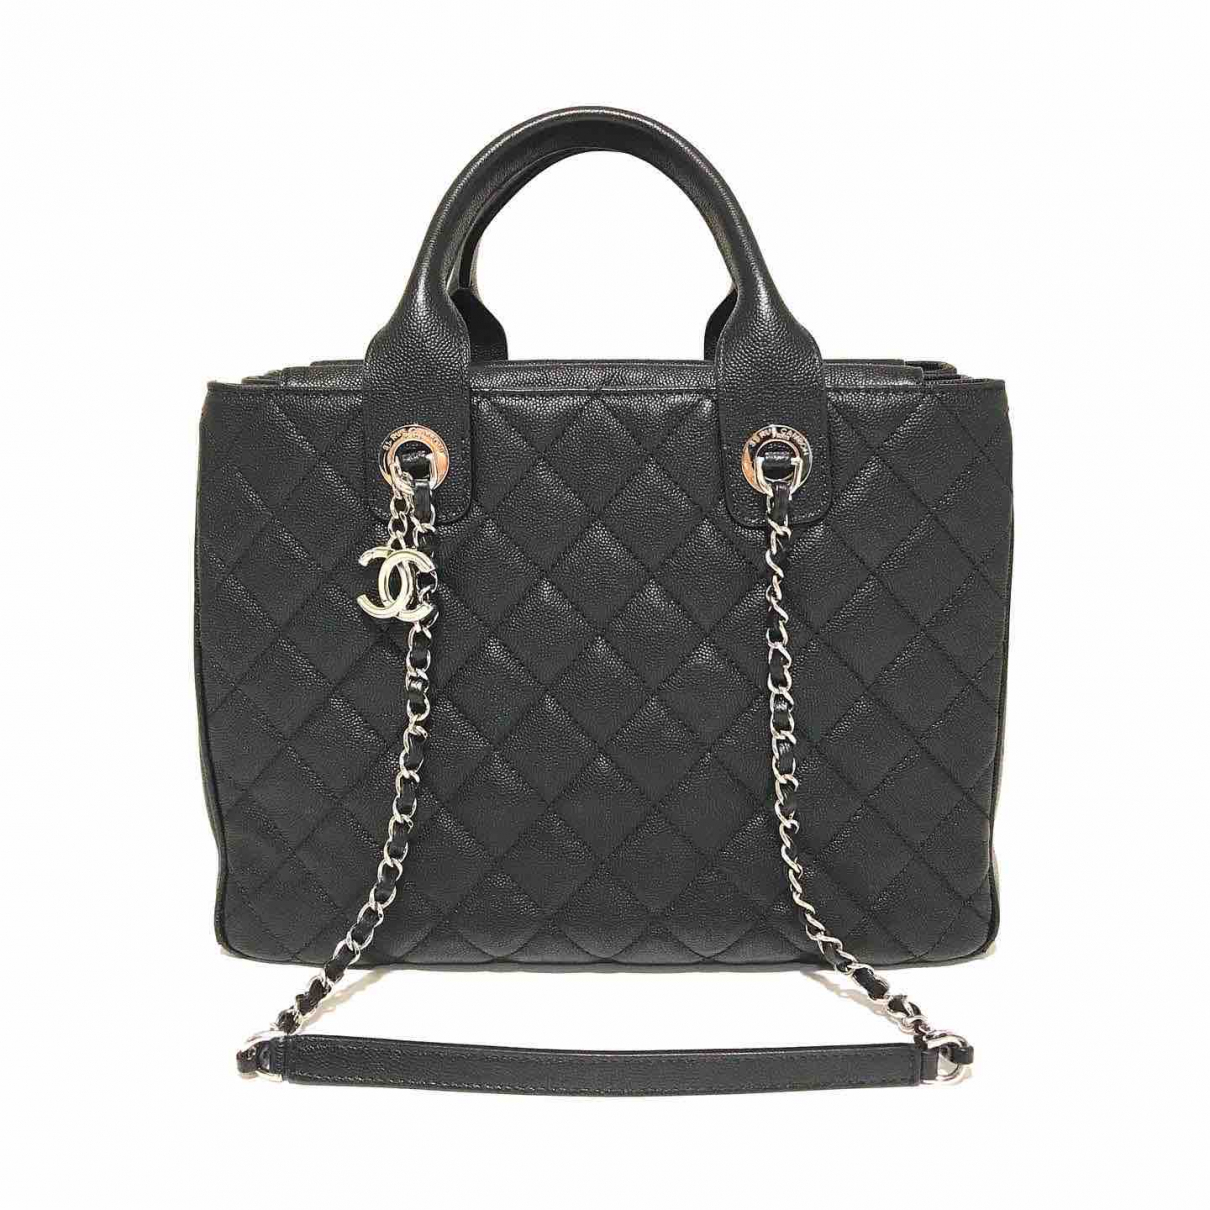 Chanel Petite Shopping Tote Black Leather handbag for Women \N